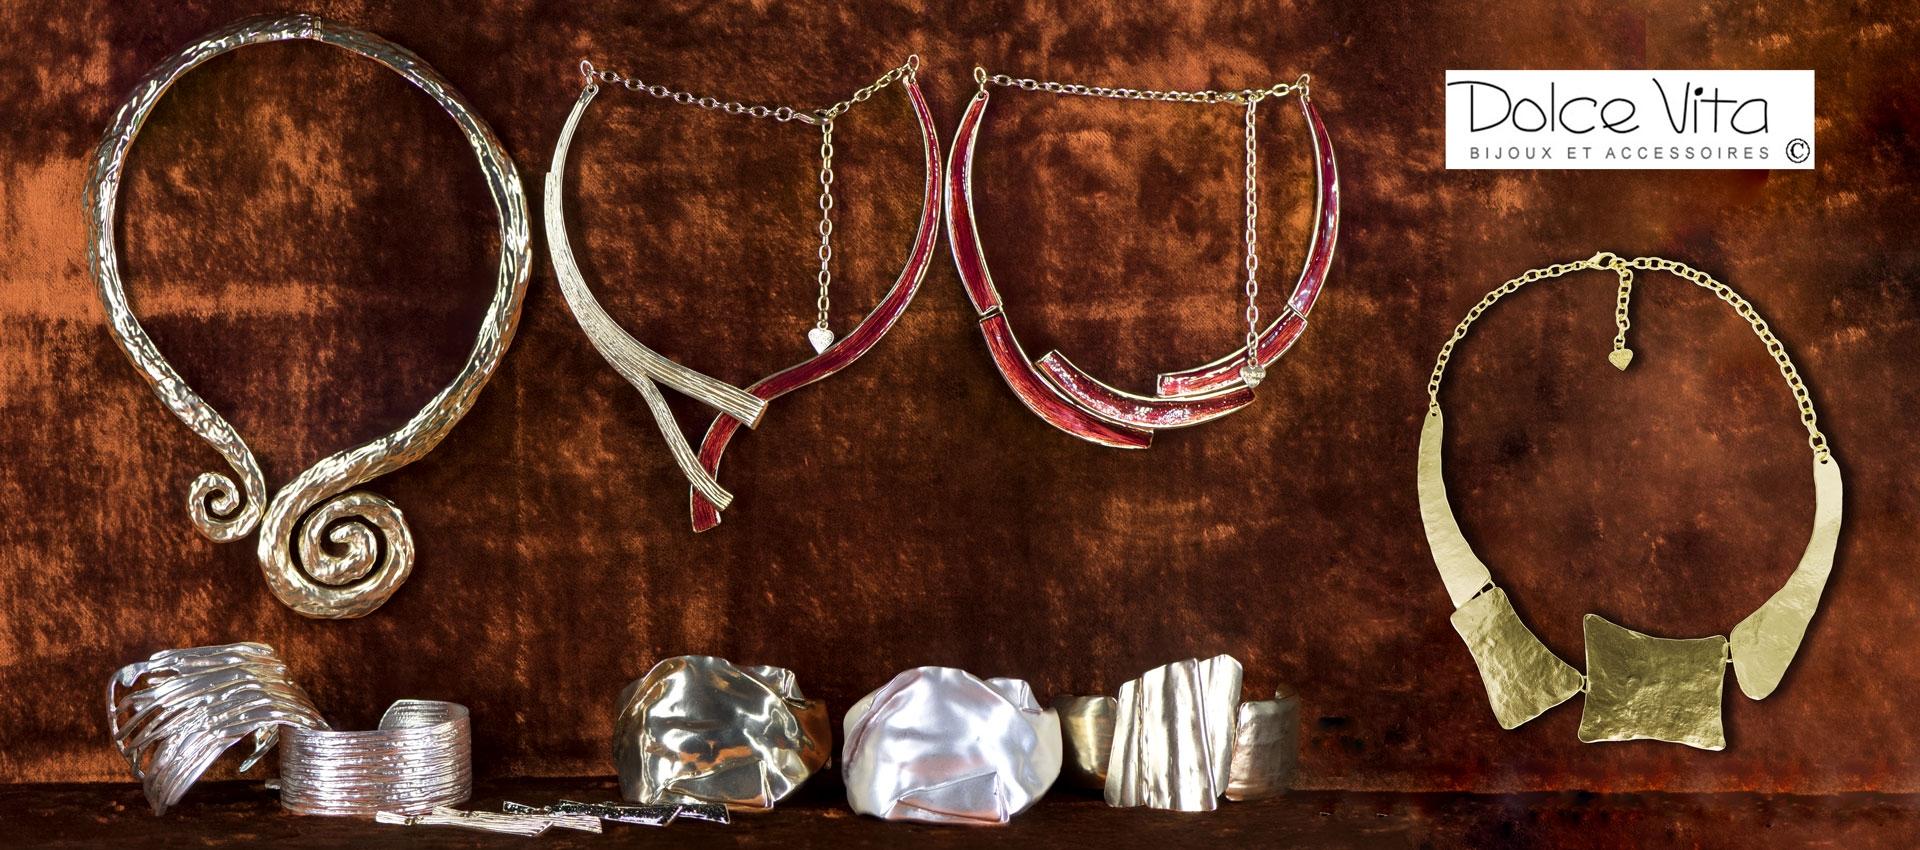 DOLCE VITA Jewelry